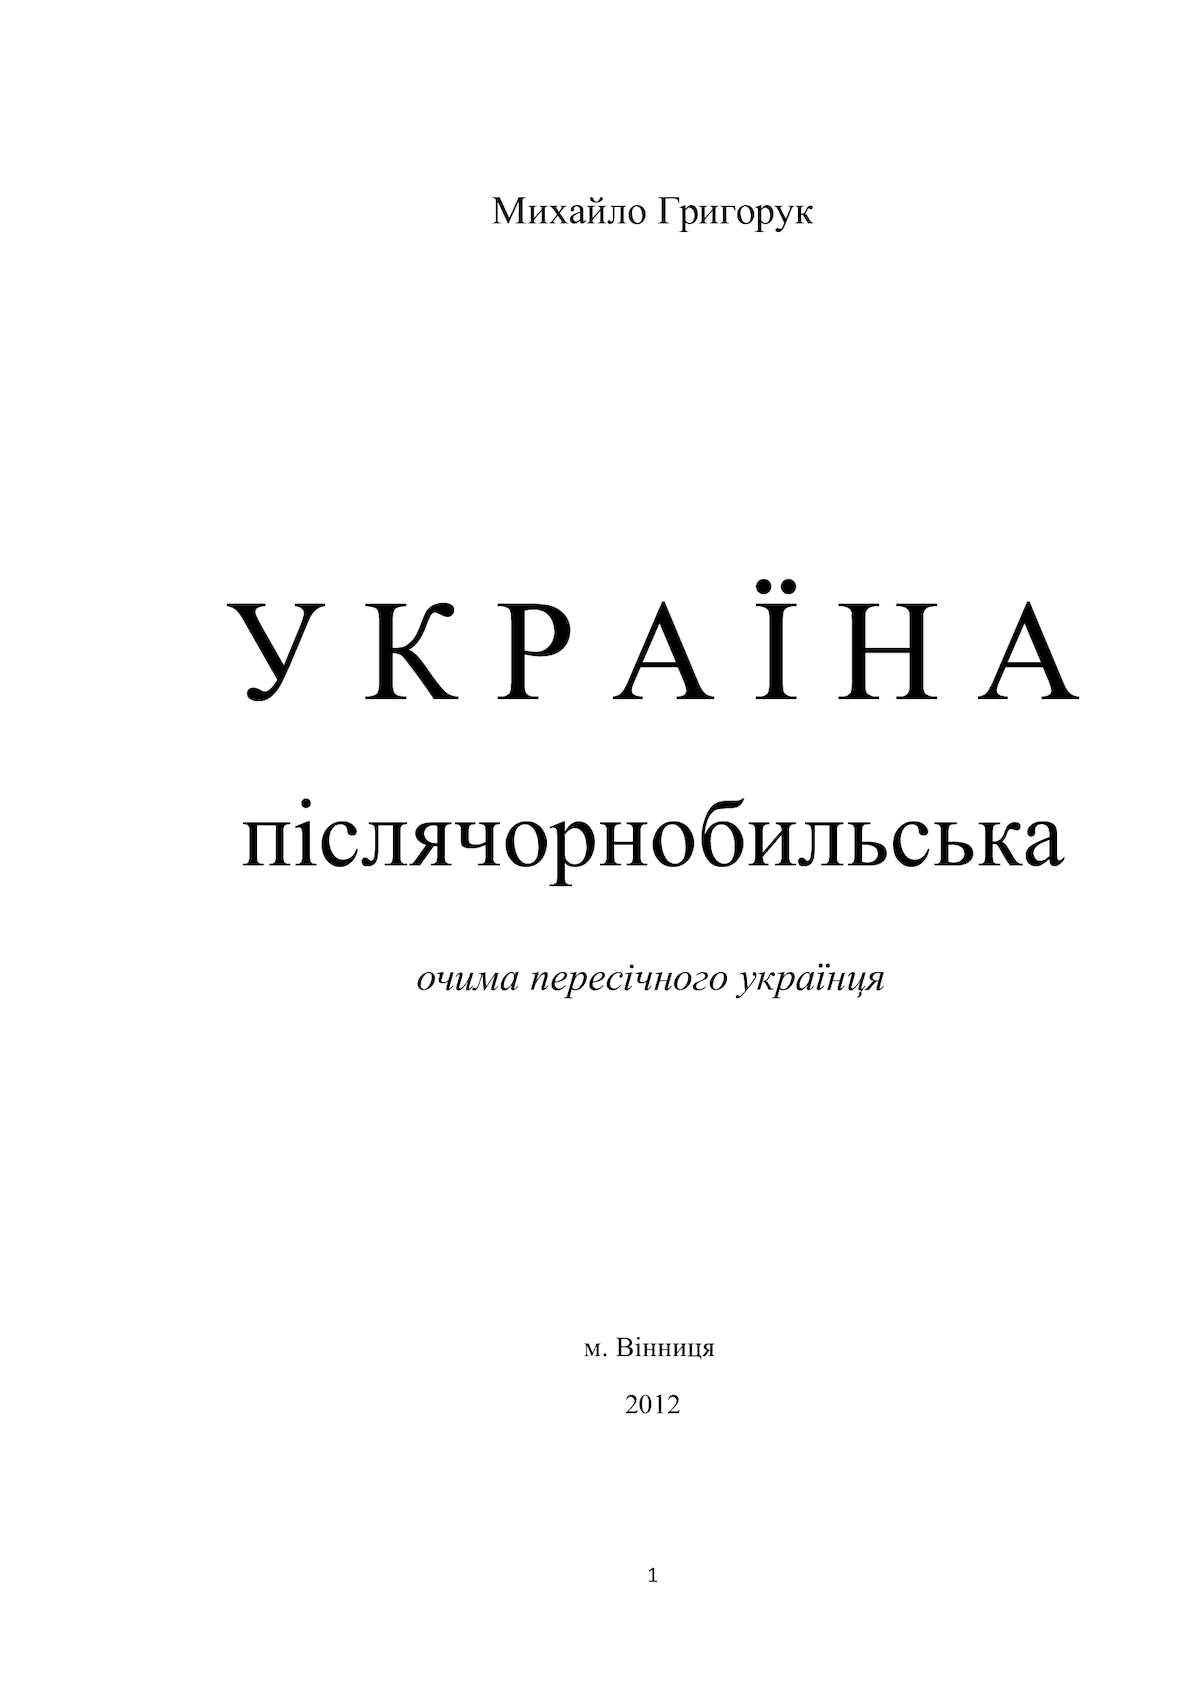 Calaméo - М. Григорук Україна післячорнобильська. ч 1 a9e7c150a2189